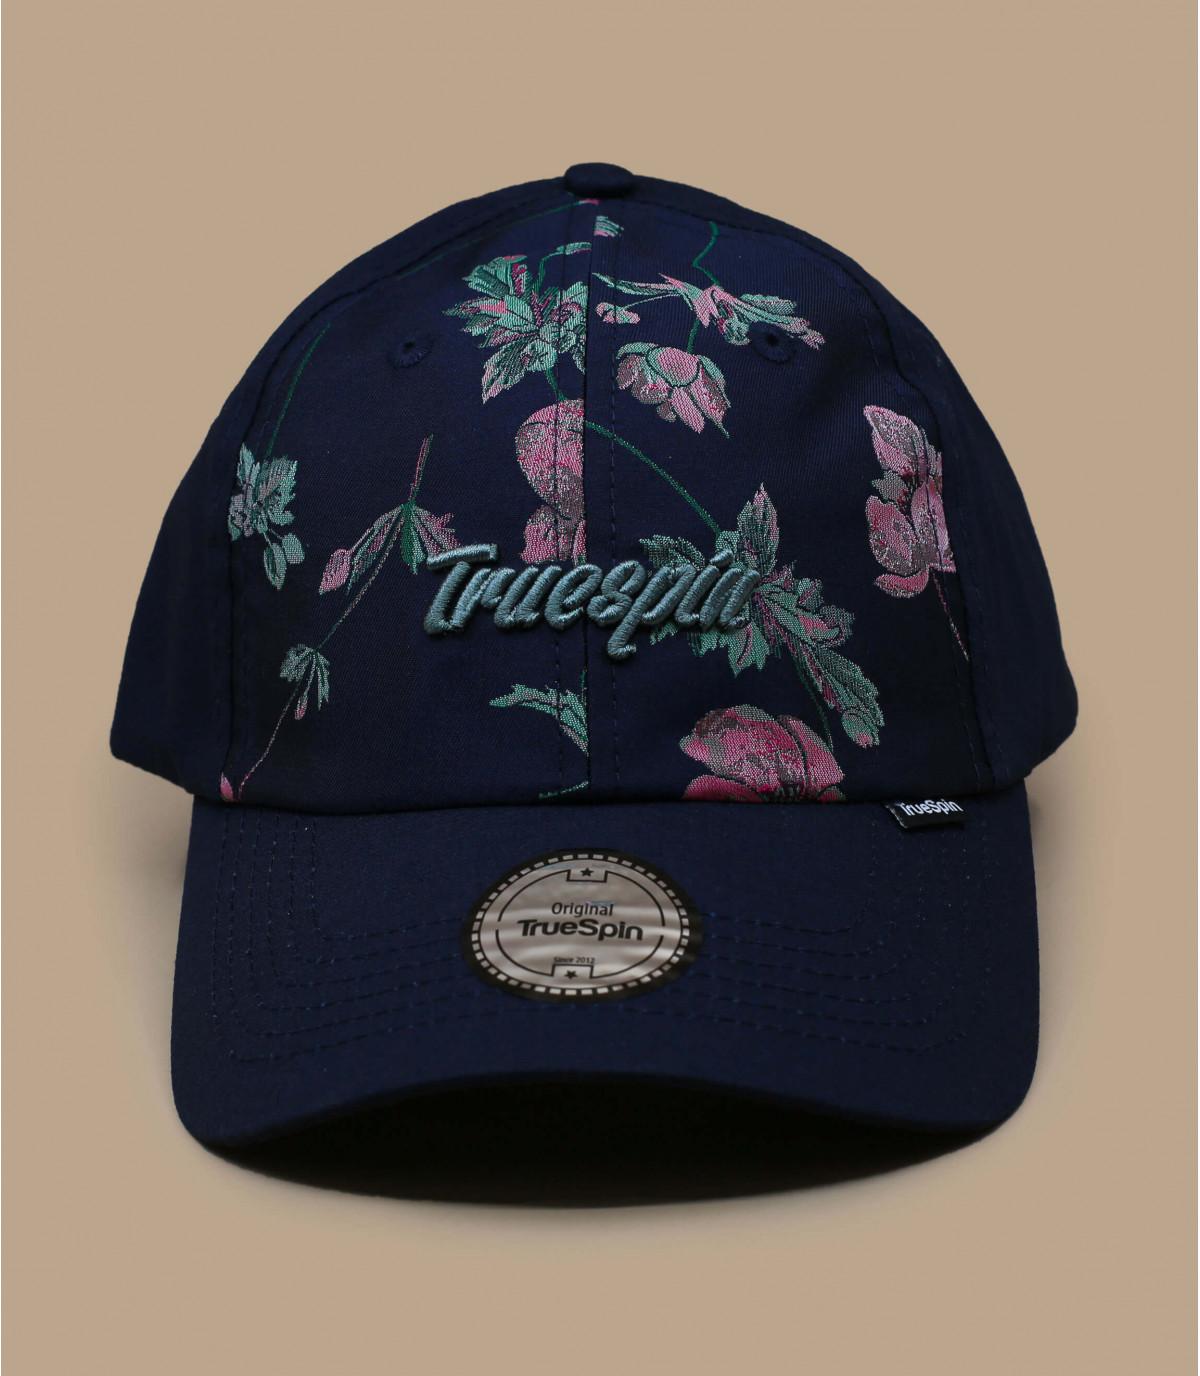 Blaue Cap Blumen Motiv